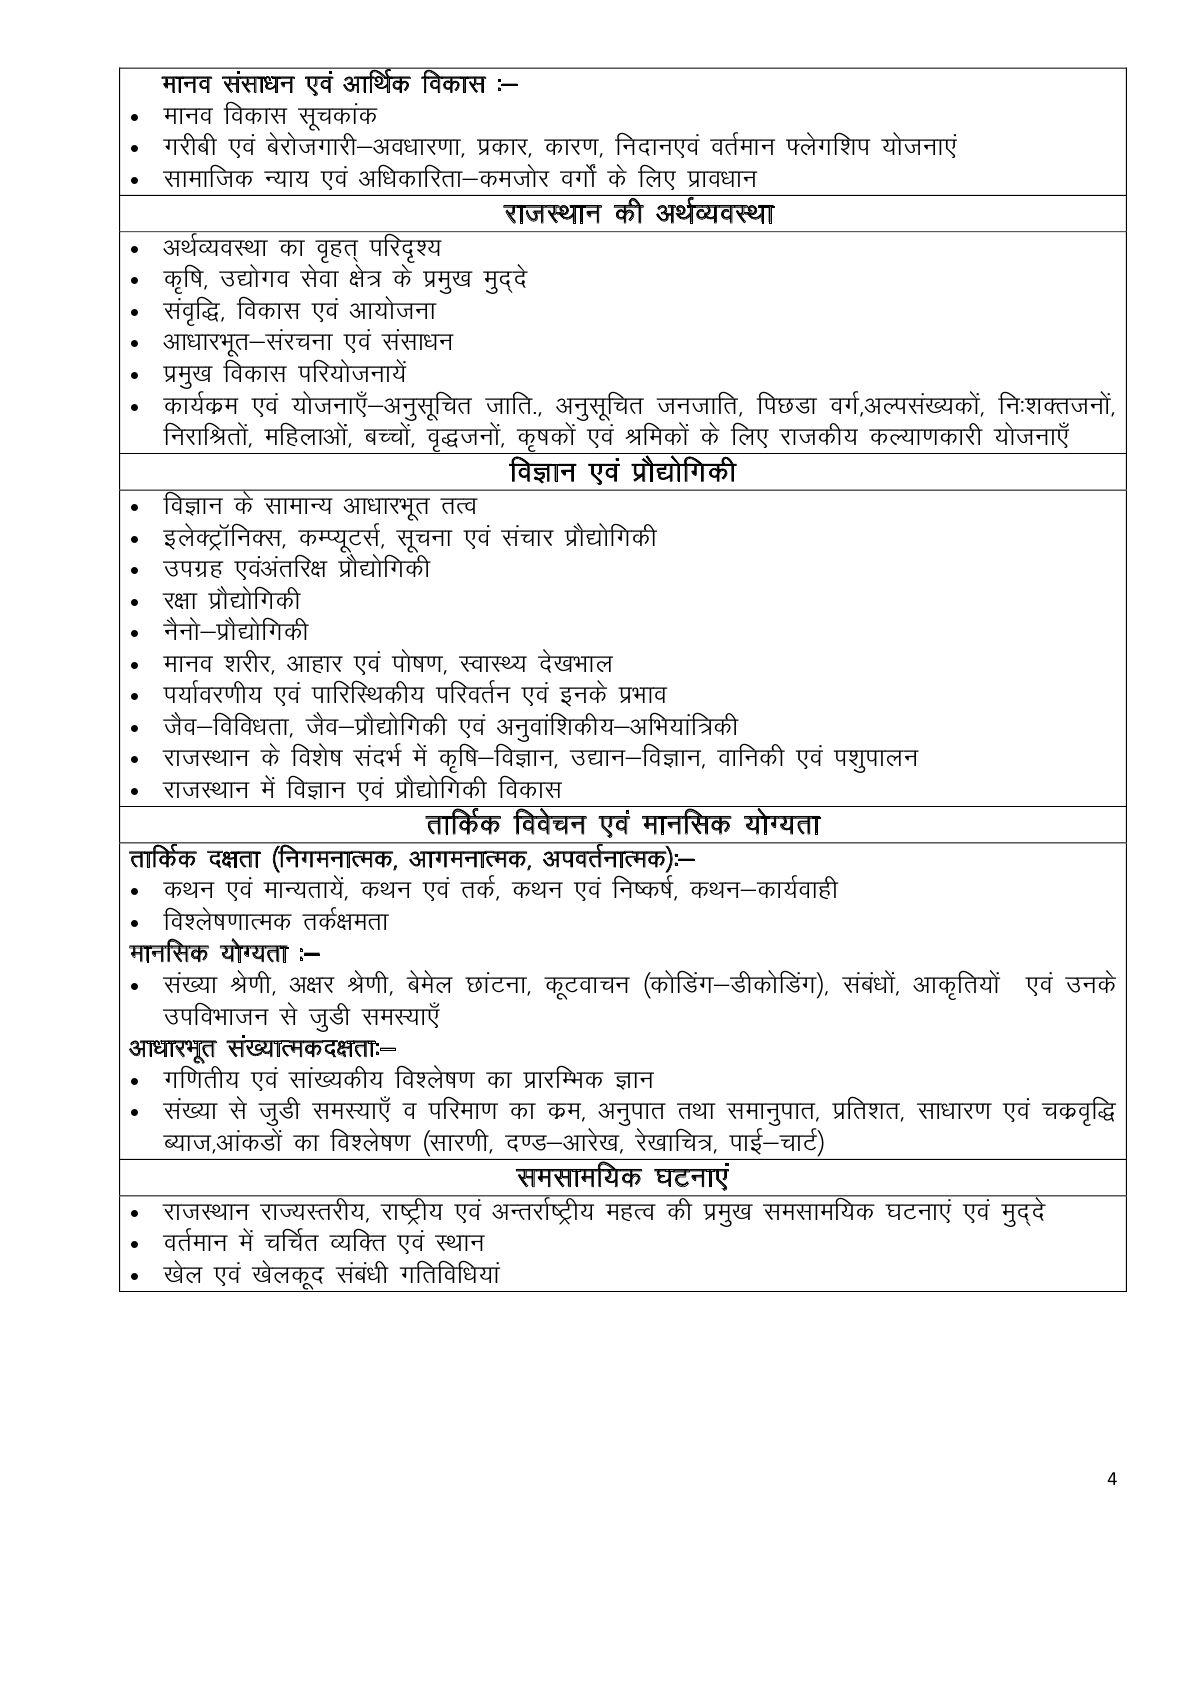 RPSC RAS Pre Exam syllabus 2016